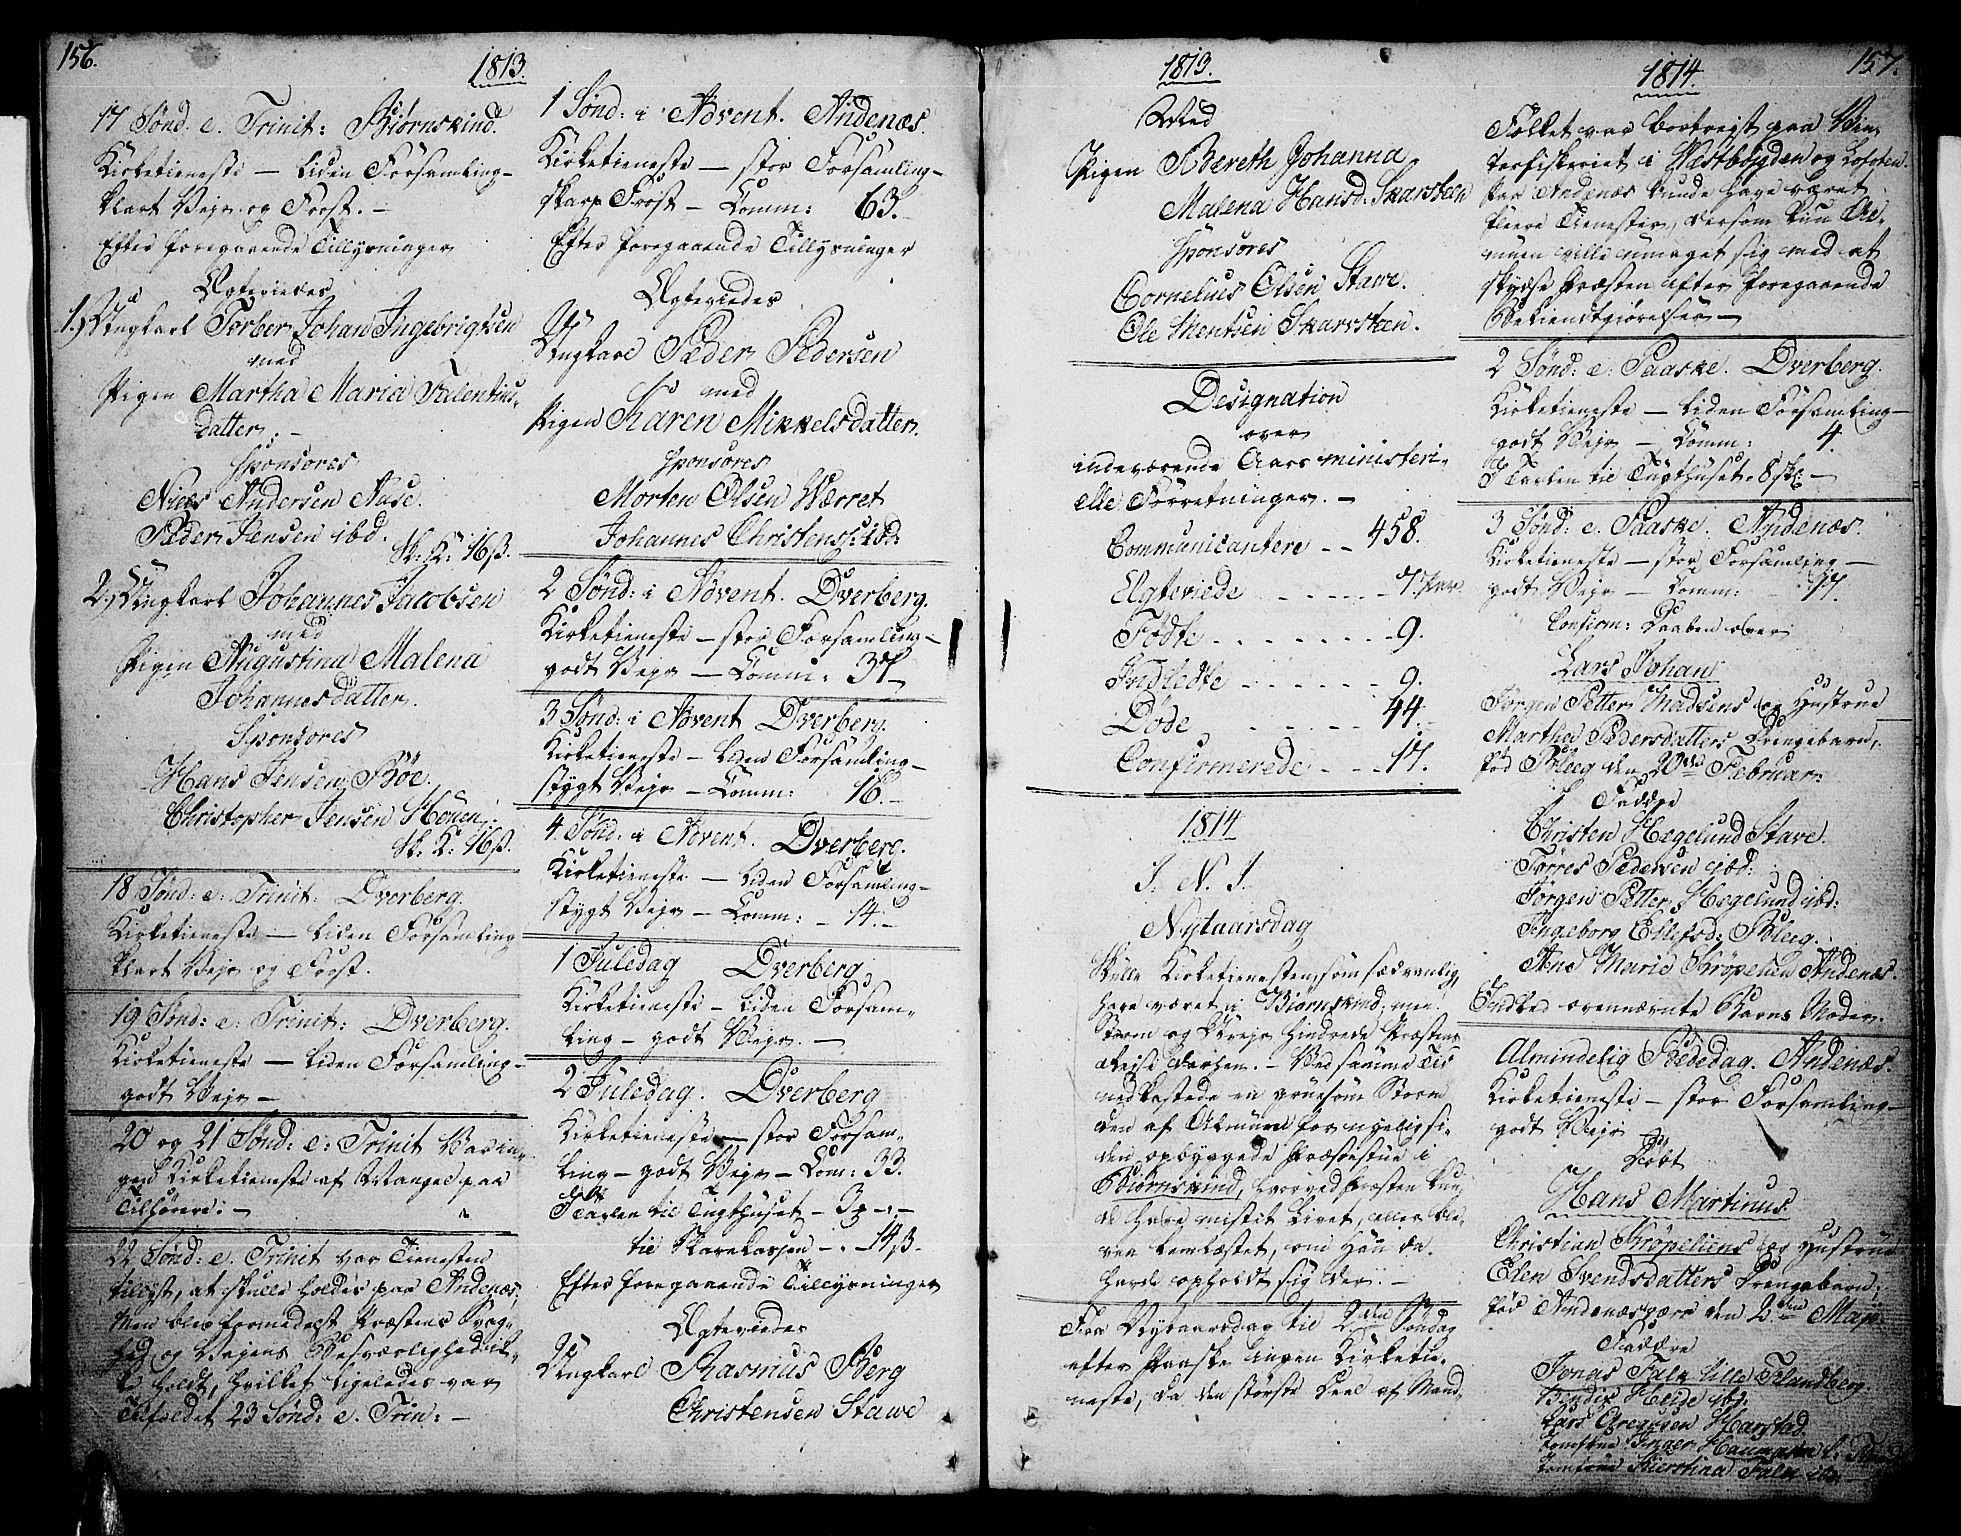 SAT, Ministerialprotokoller, klokkerbøker og fødselsregistre - Nordland, 897/L1394: Ministerialbok nr. 897A02, 1788-1820, s. 156-157